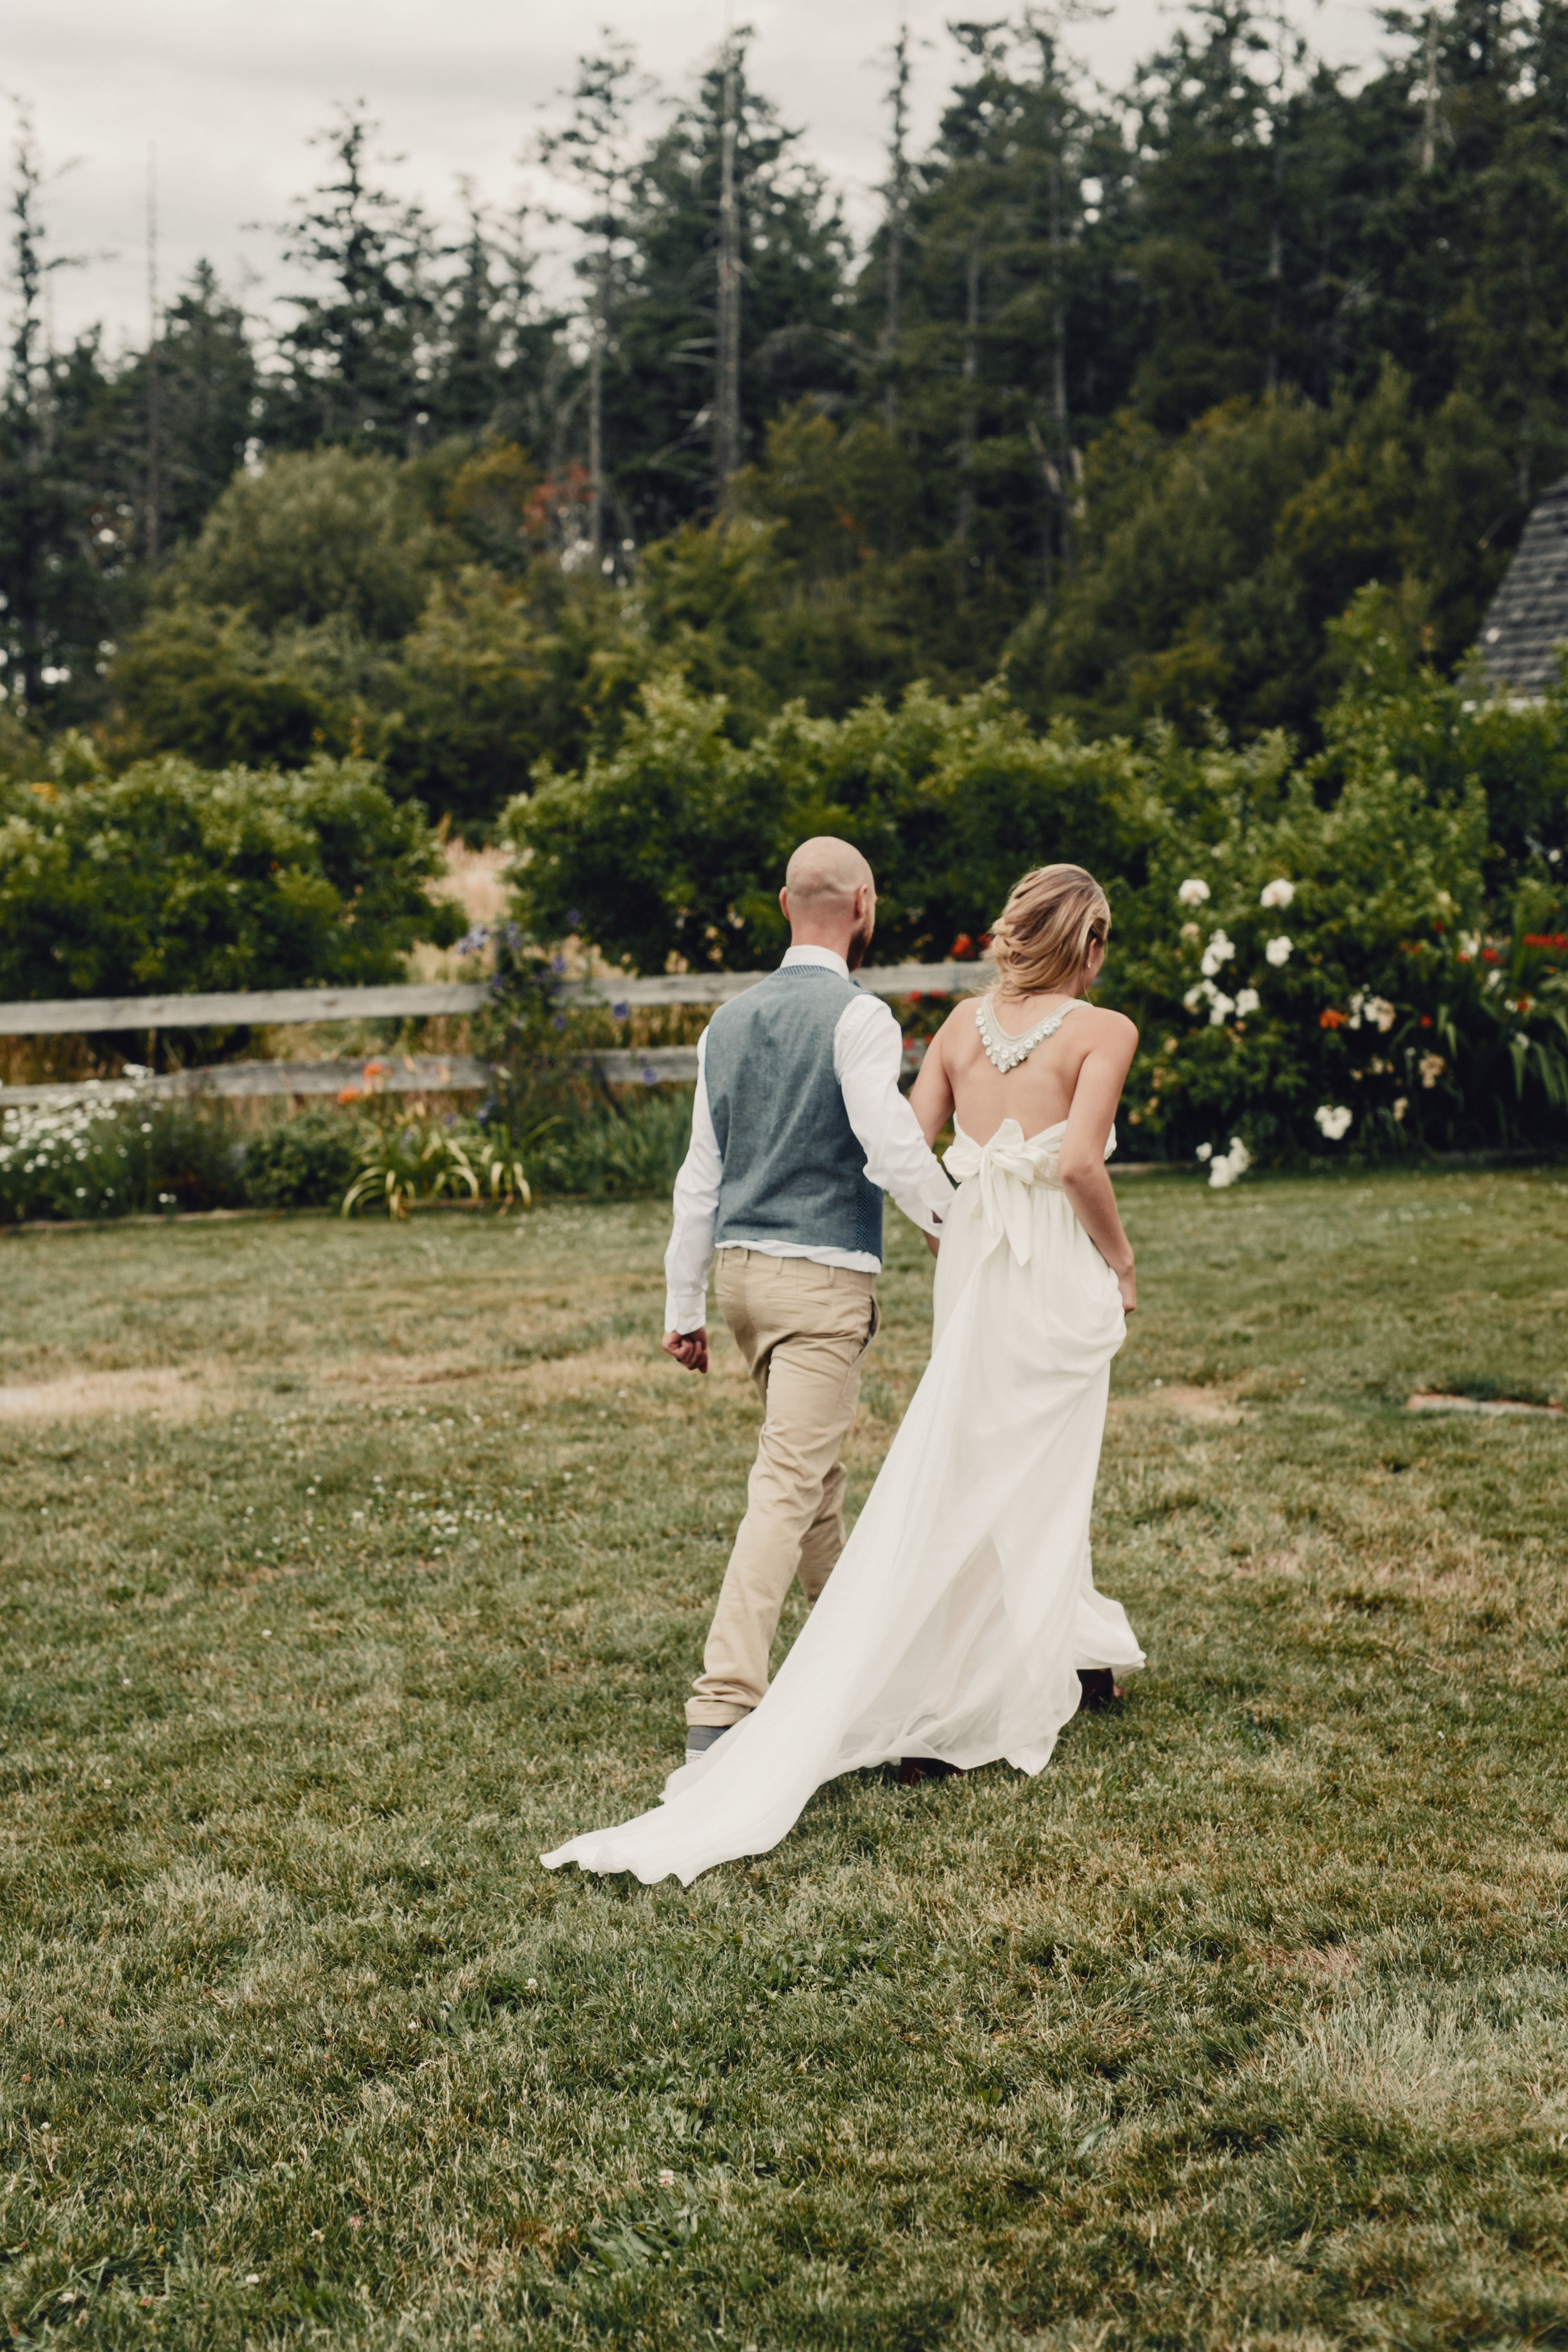 kildara-farms-wedding-photo-inspiration-0051